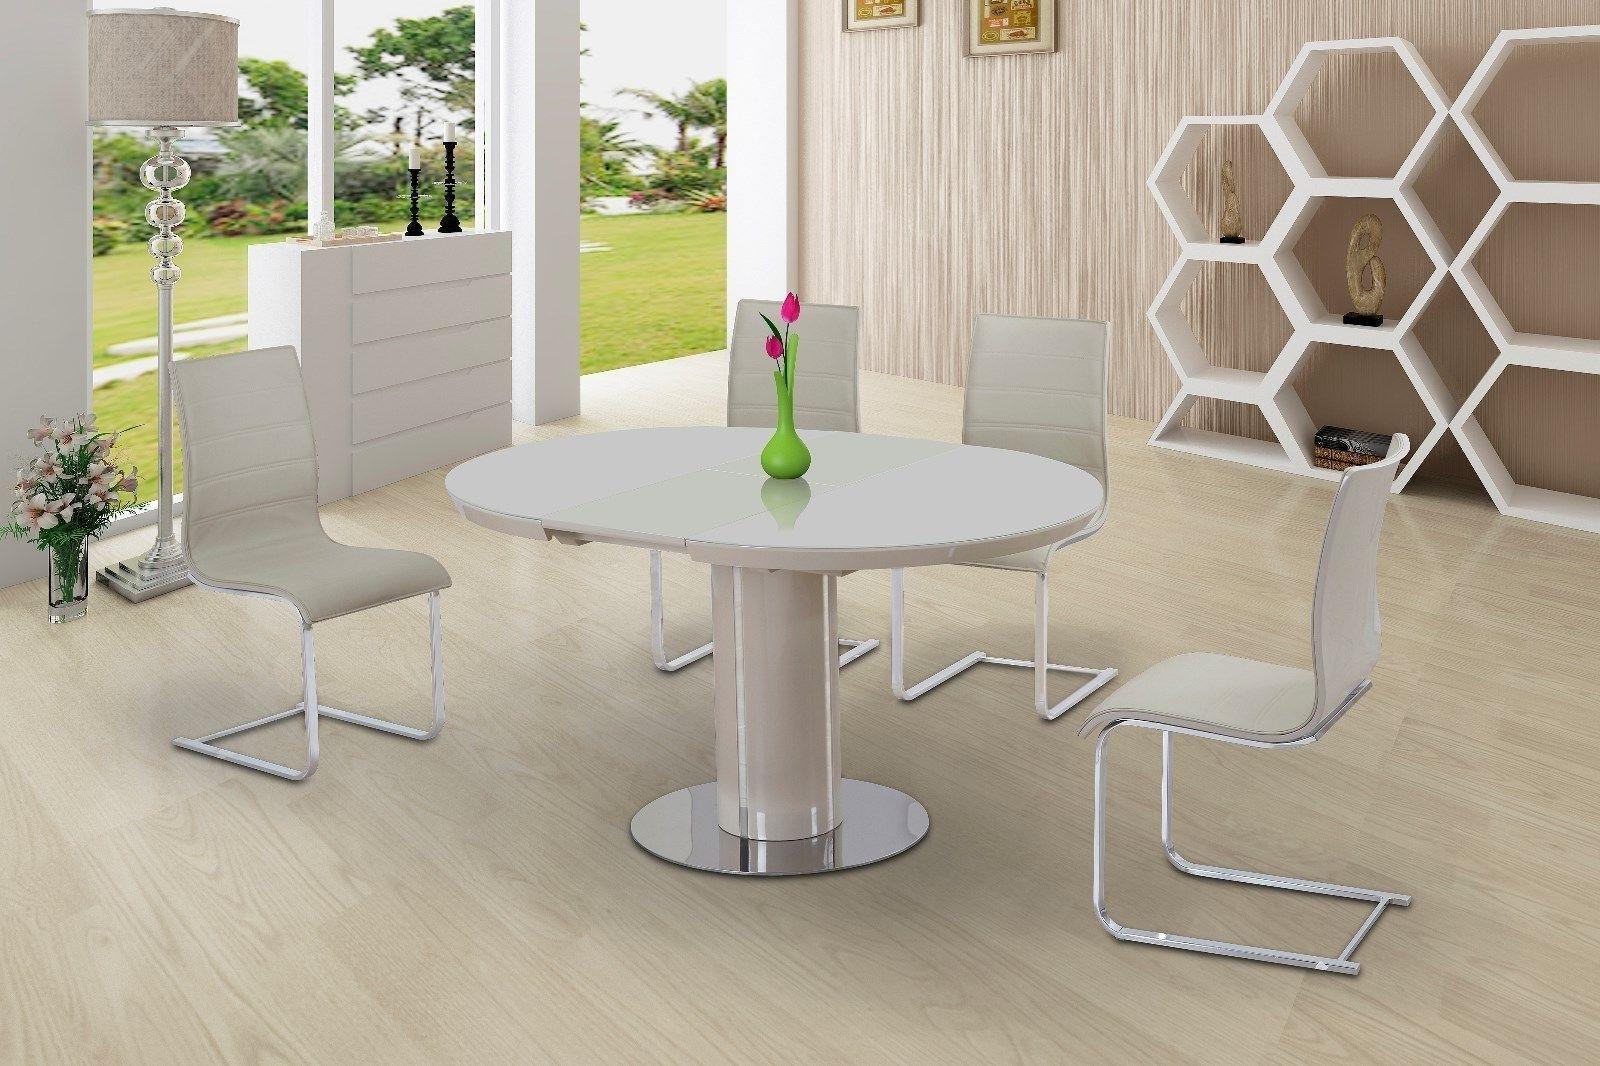 Most Popular Wynn High Gloss Back Dining Chairs Only – Cream For High Gloss White Dining Chairs (View 16 of 25)